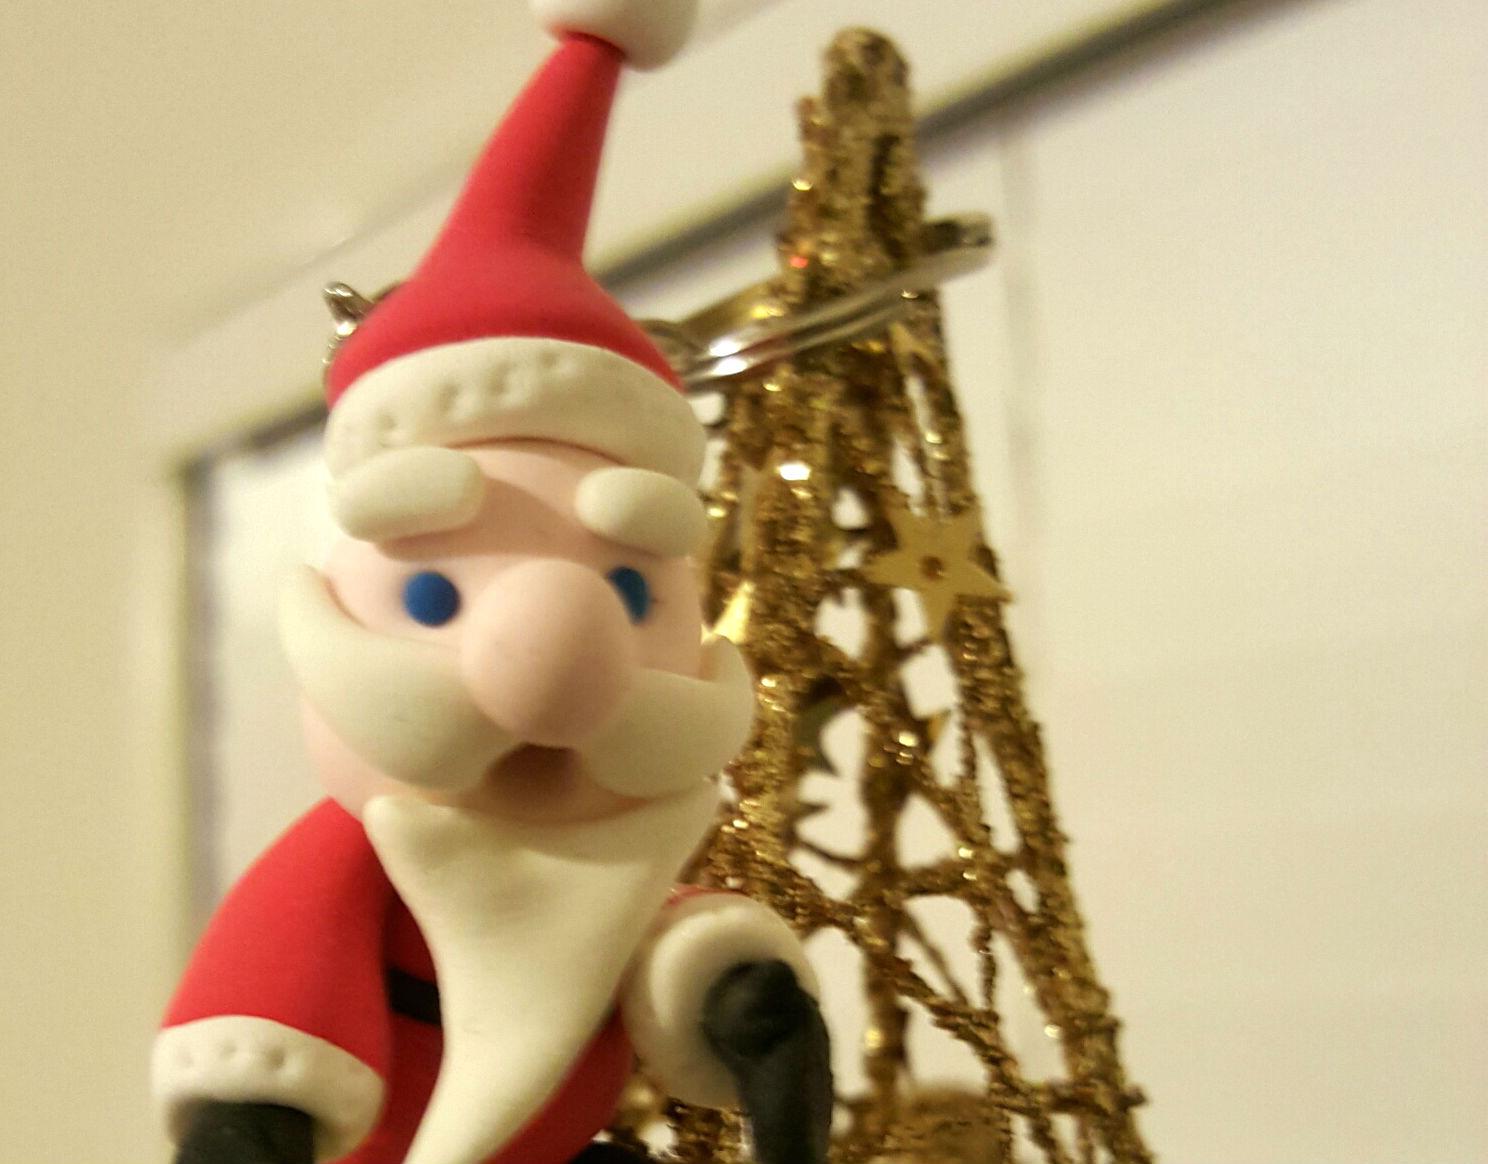 Mini Santa Claus figurine for beginners